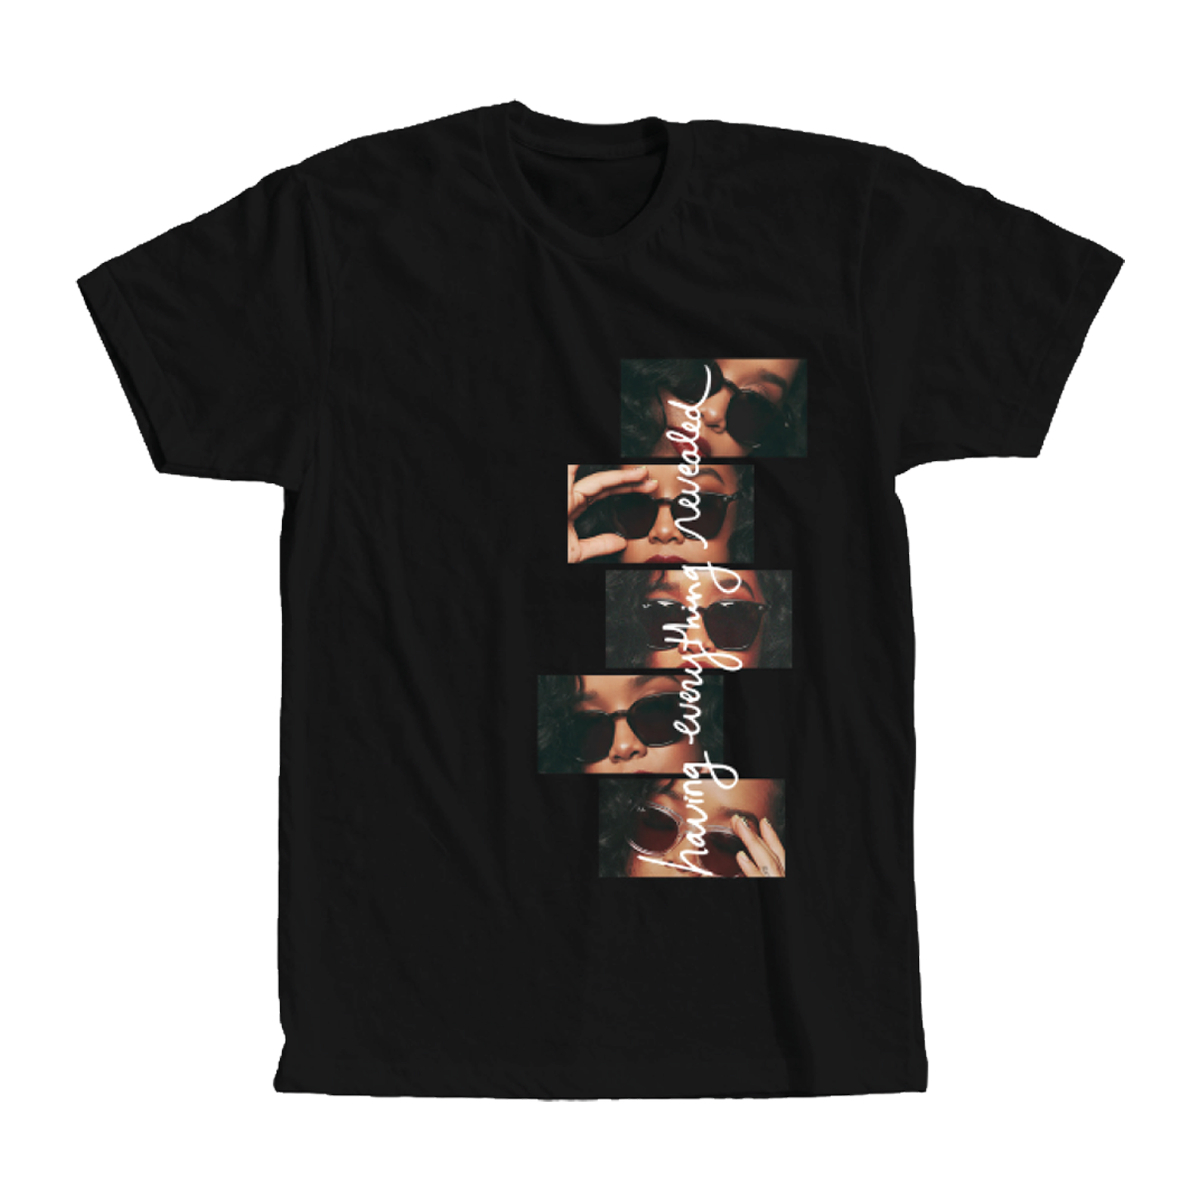 H.E.R. Image Stack and Lyrics Black T-Shirt